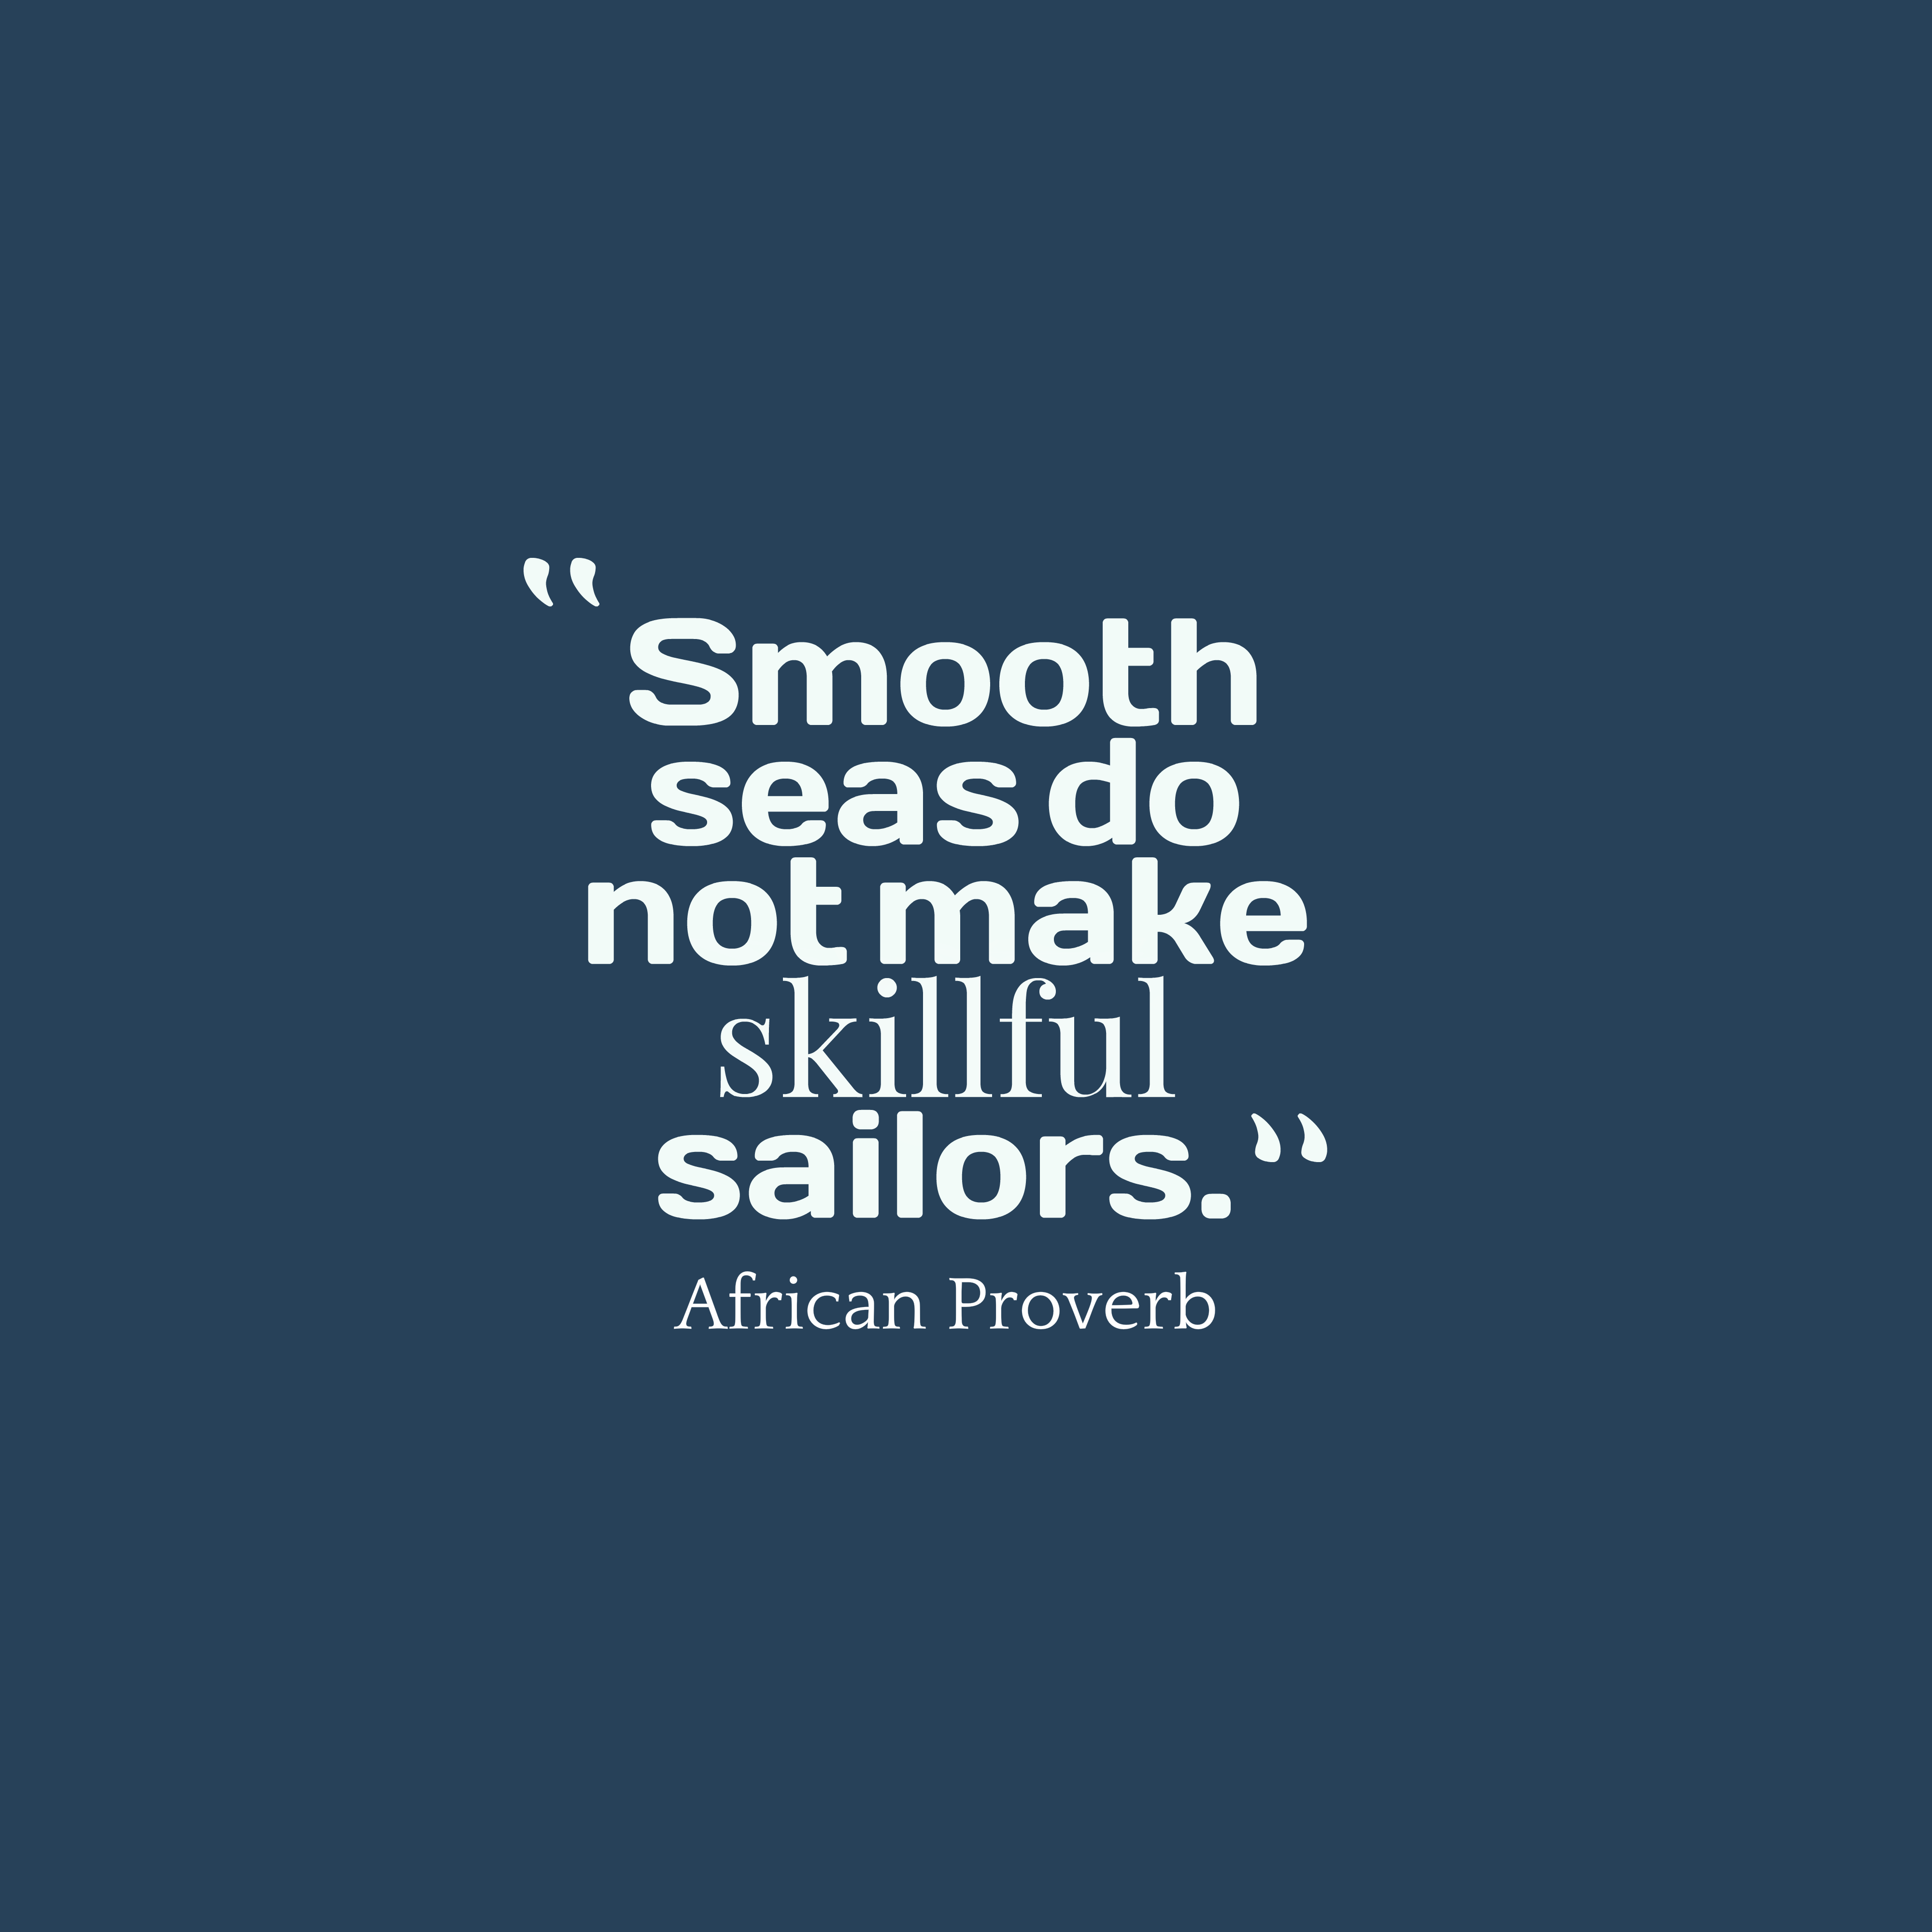 hi-res image of Smooth seas do not make skillful sailors.